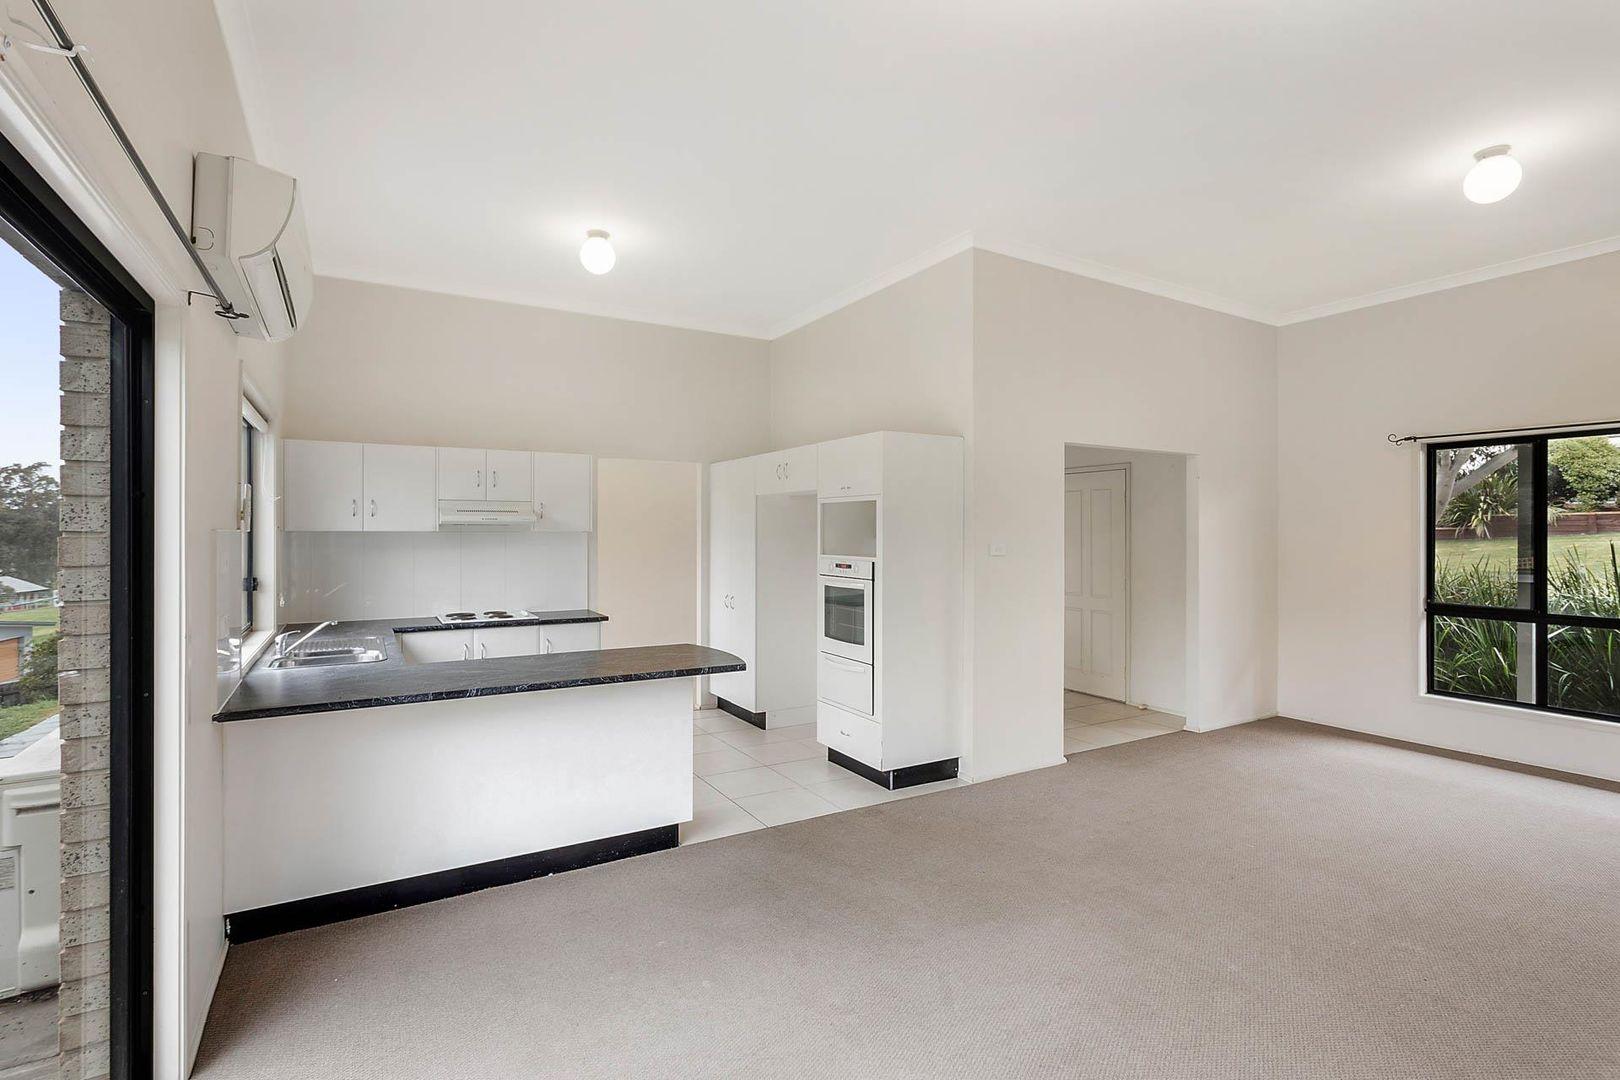 1 Glen Mia Drive, Bega NSW 2550, Image 1